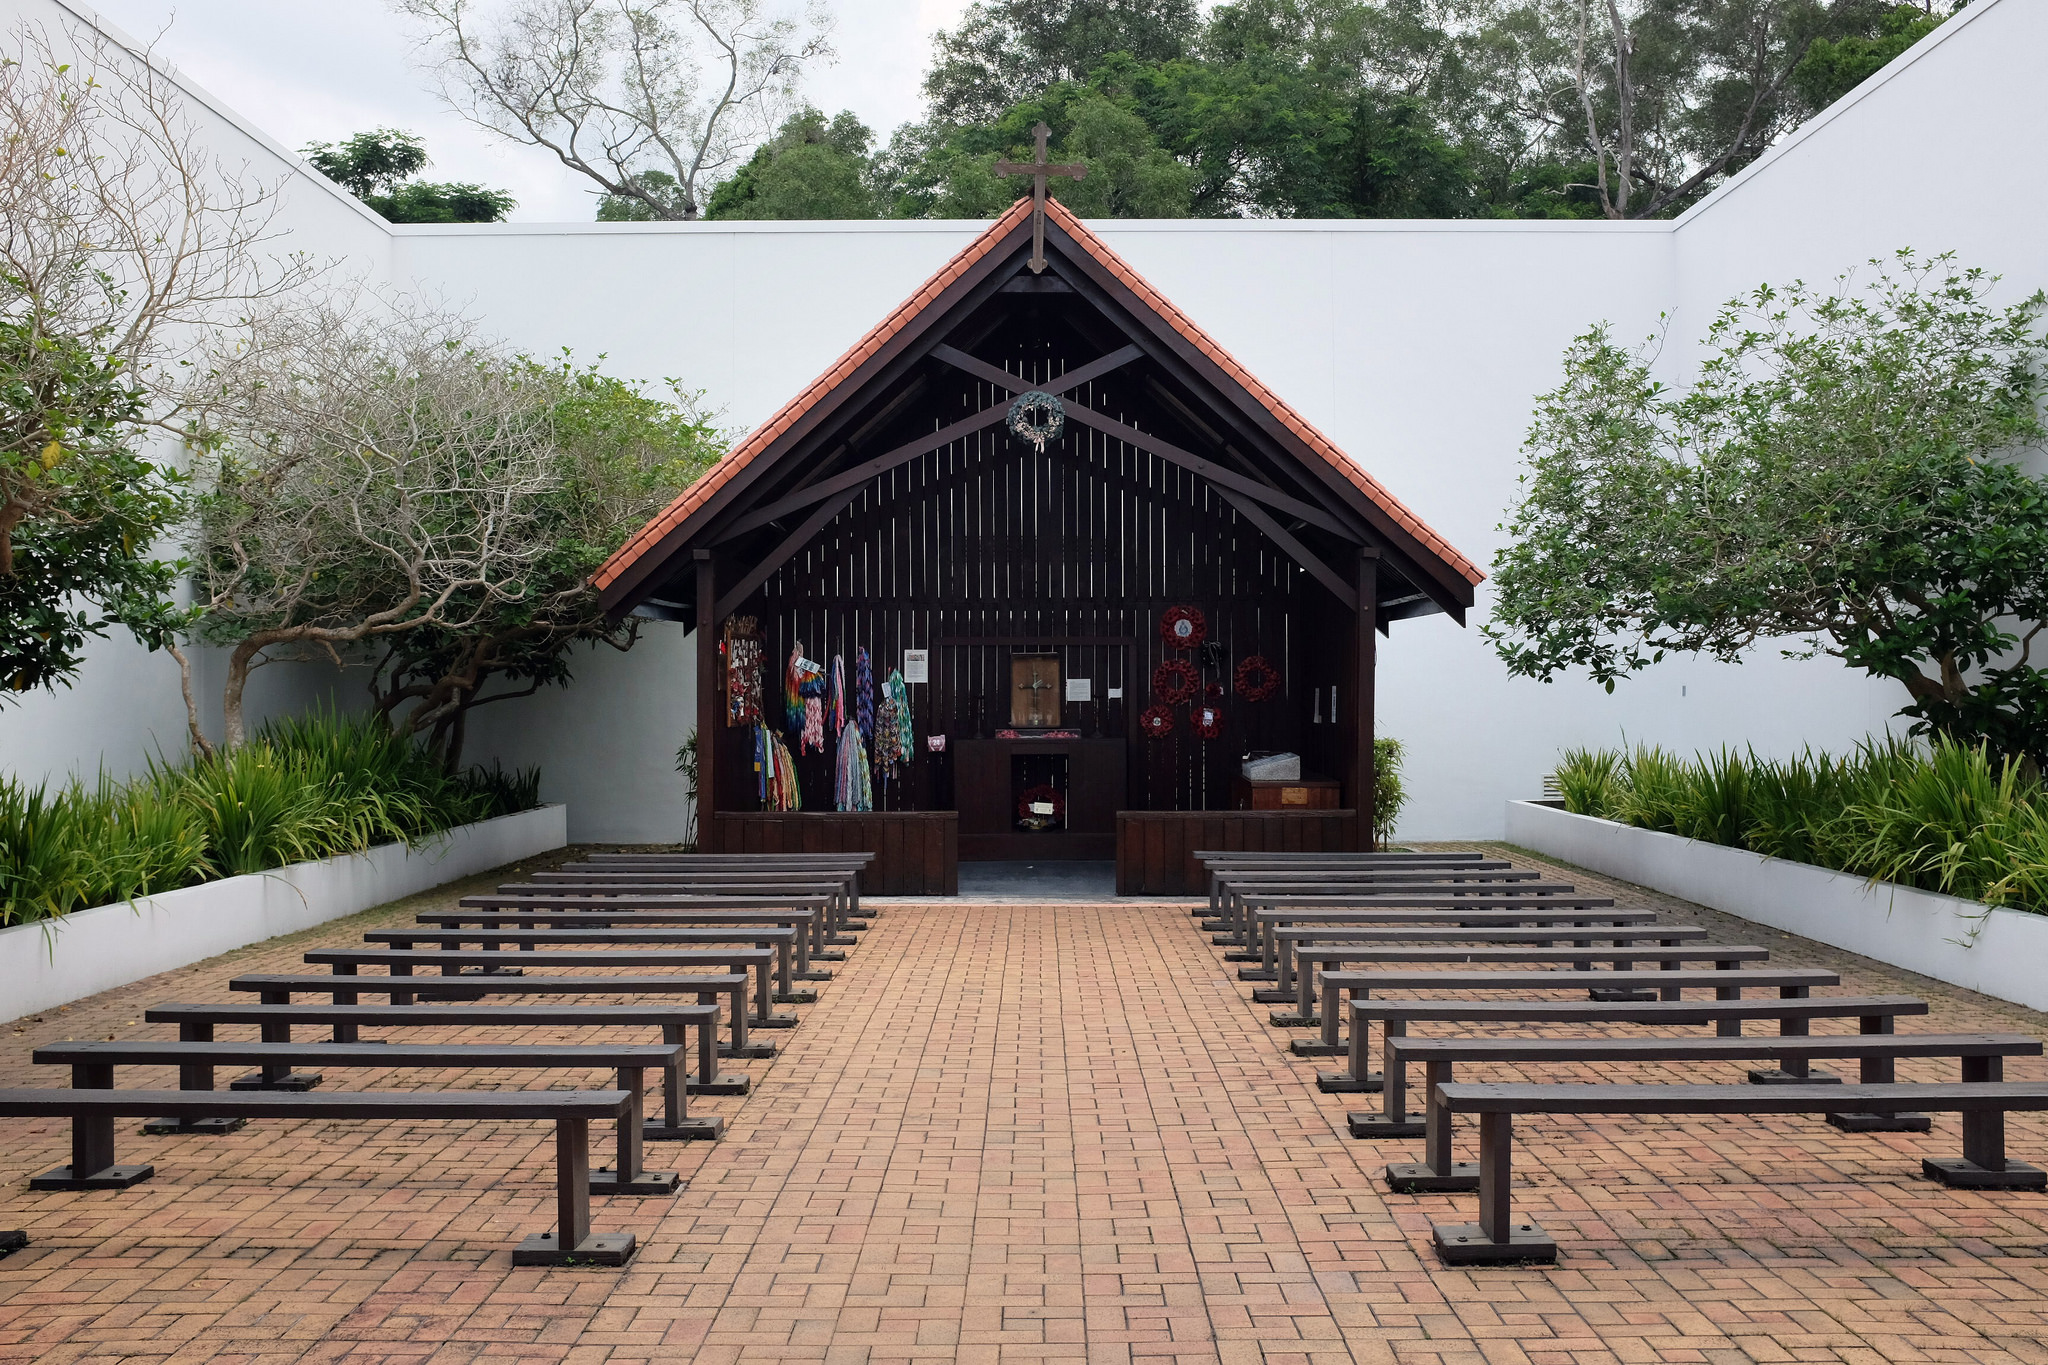 Changi Chapel Museum